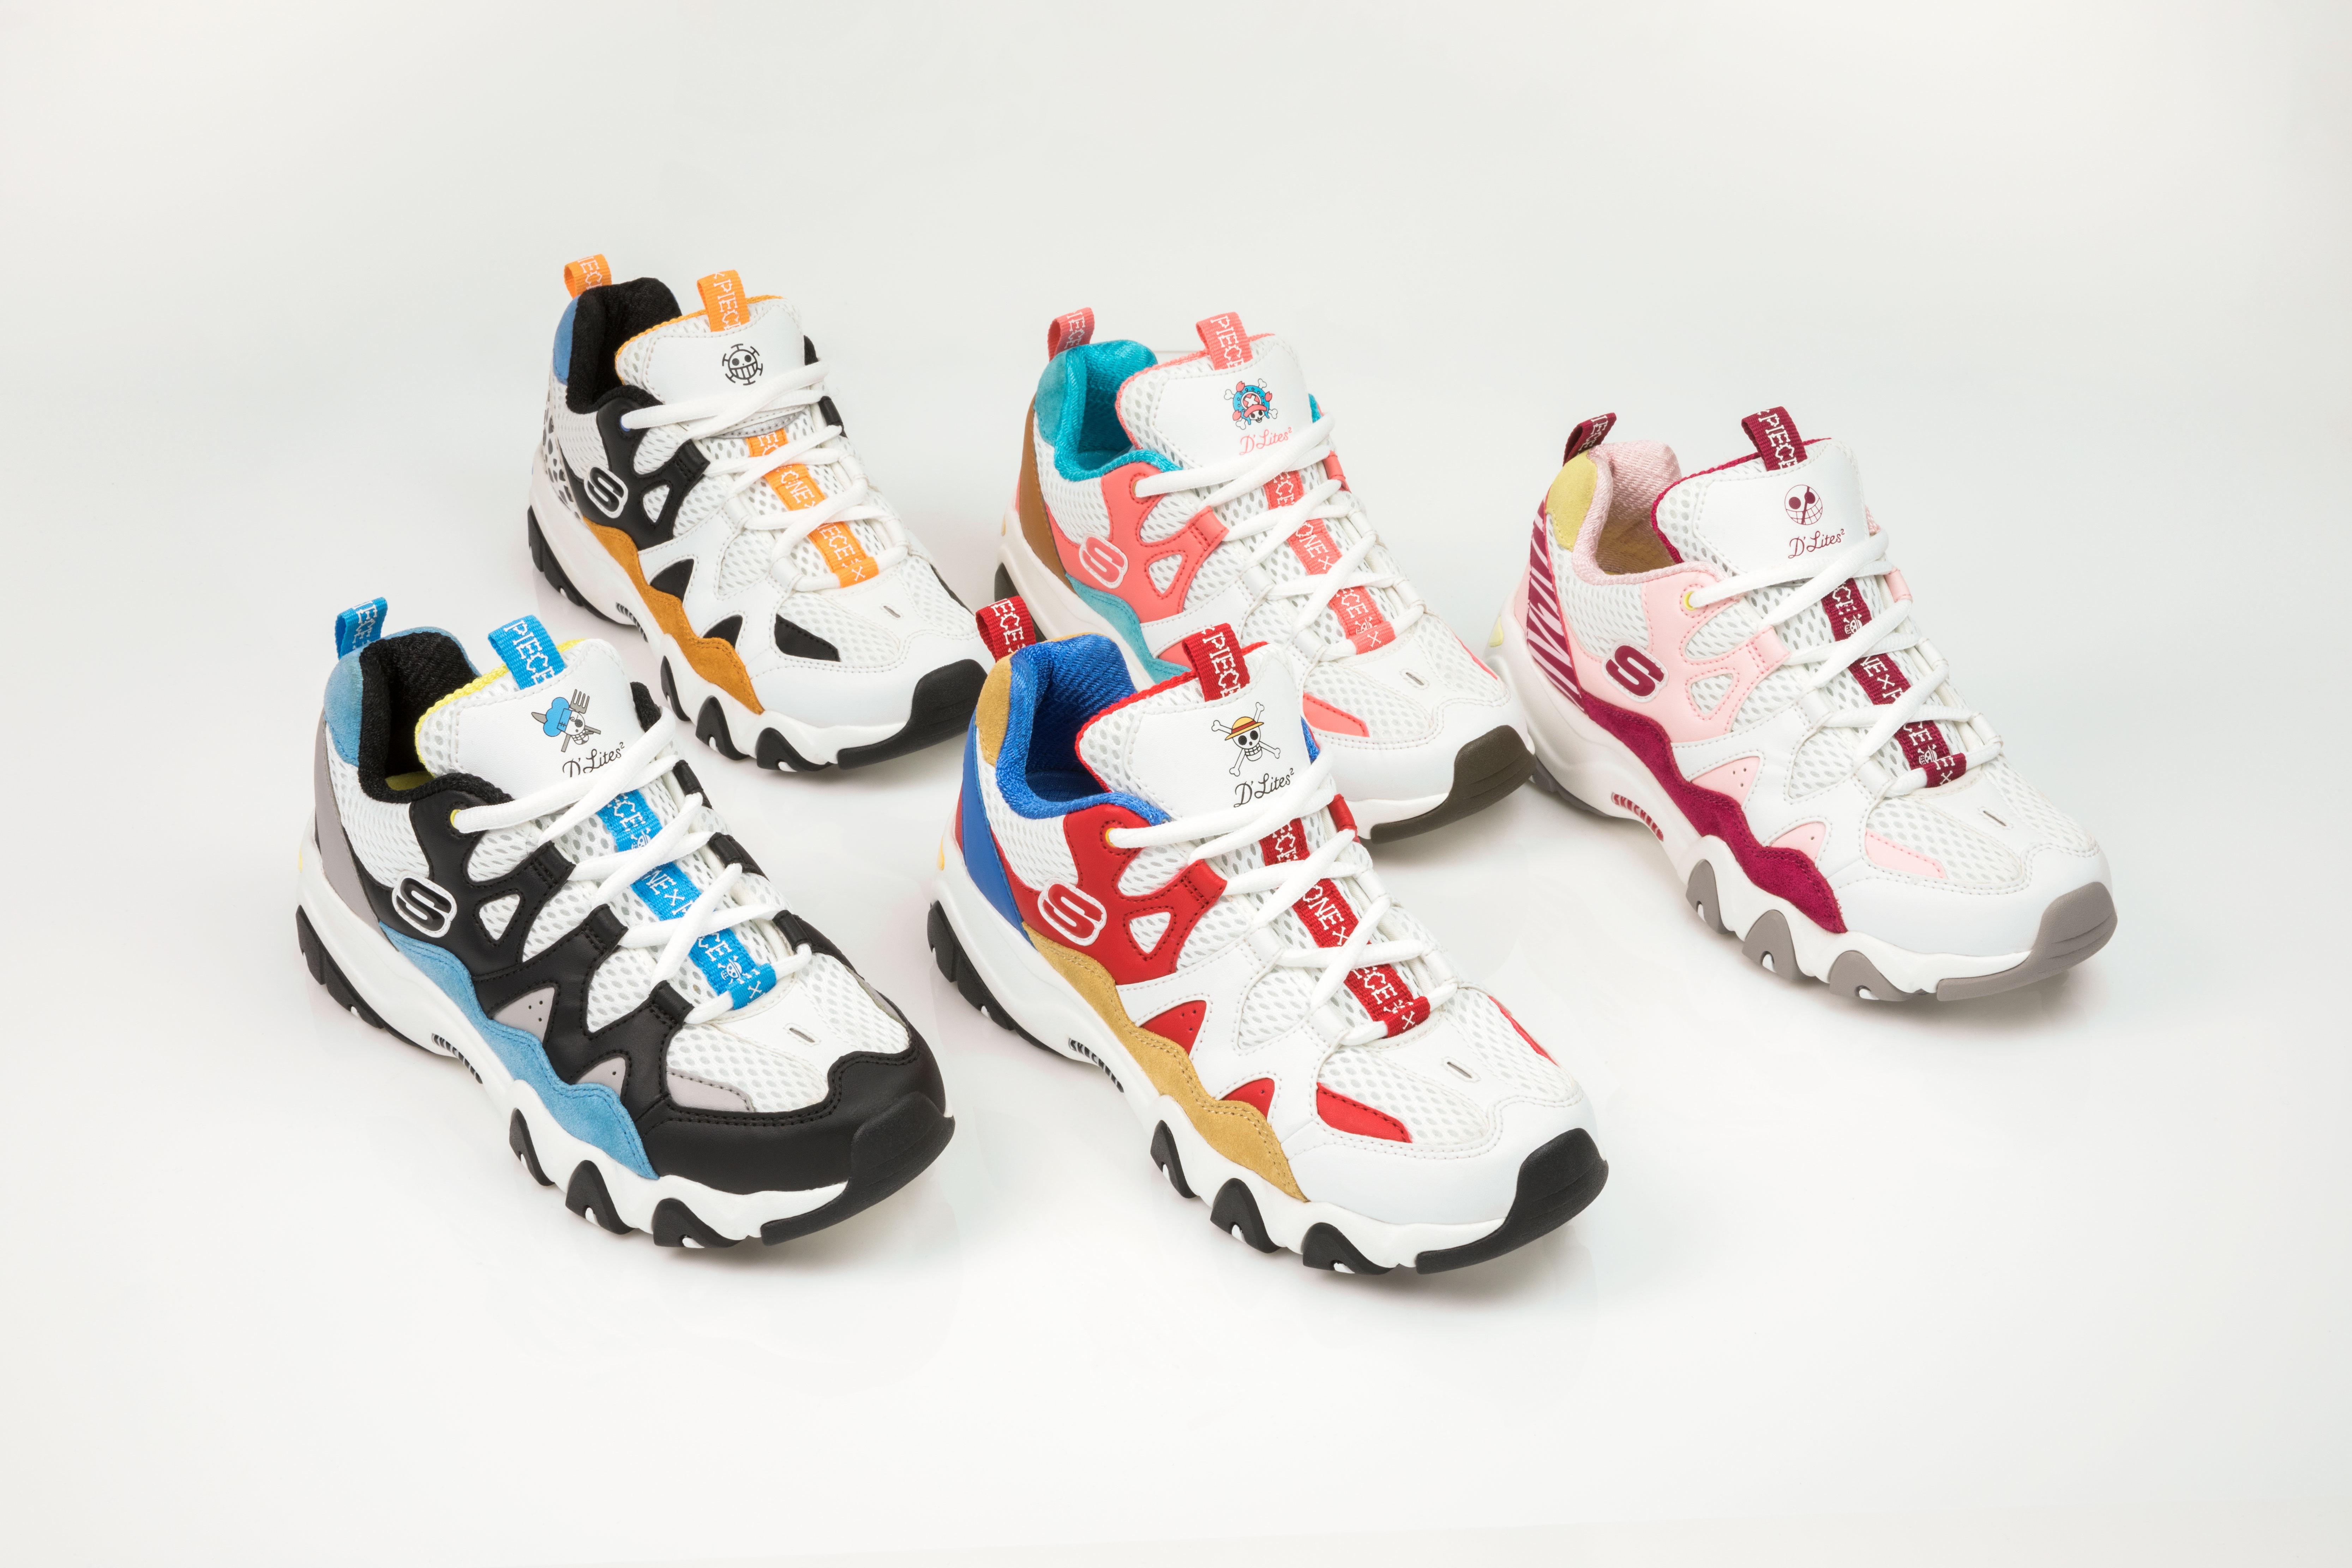 Limited Edition Skechers D'Lites \u0026 Toei